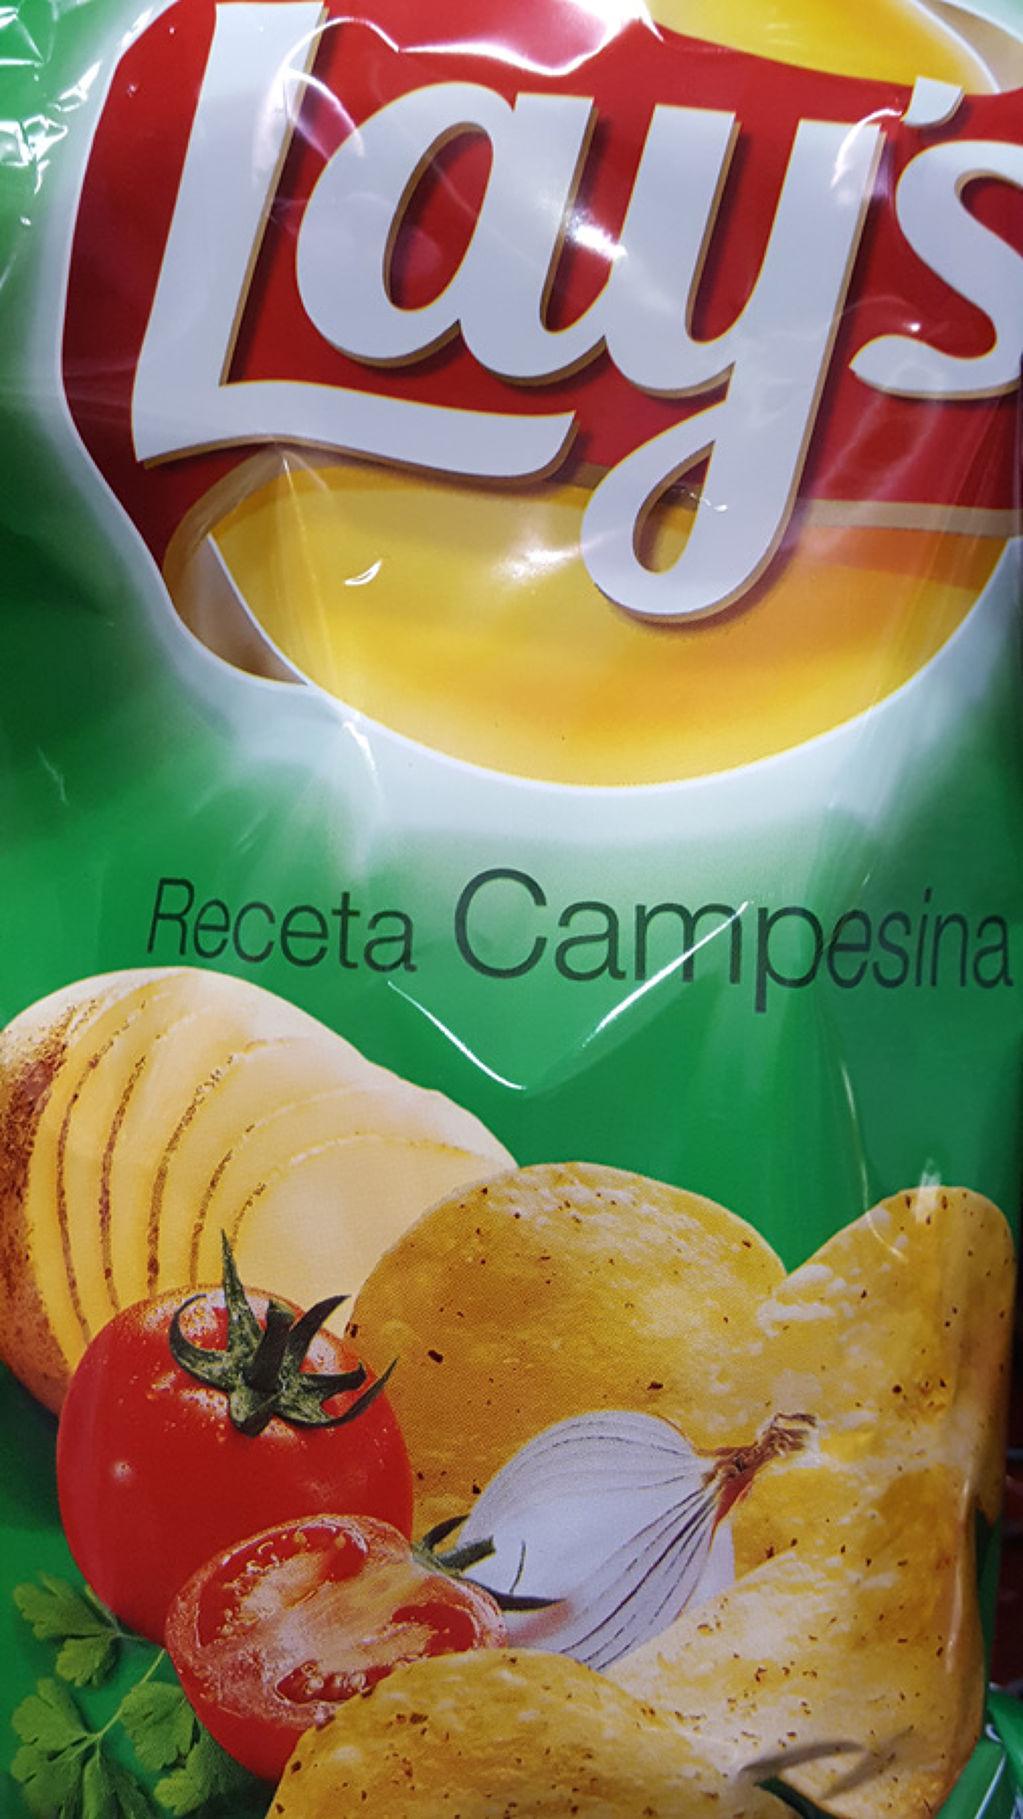 Lays campesinas - f18d0-20200509_083209.jpg